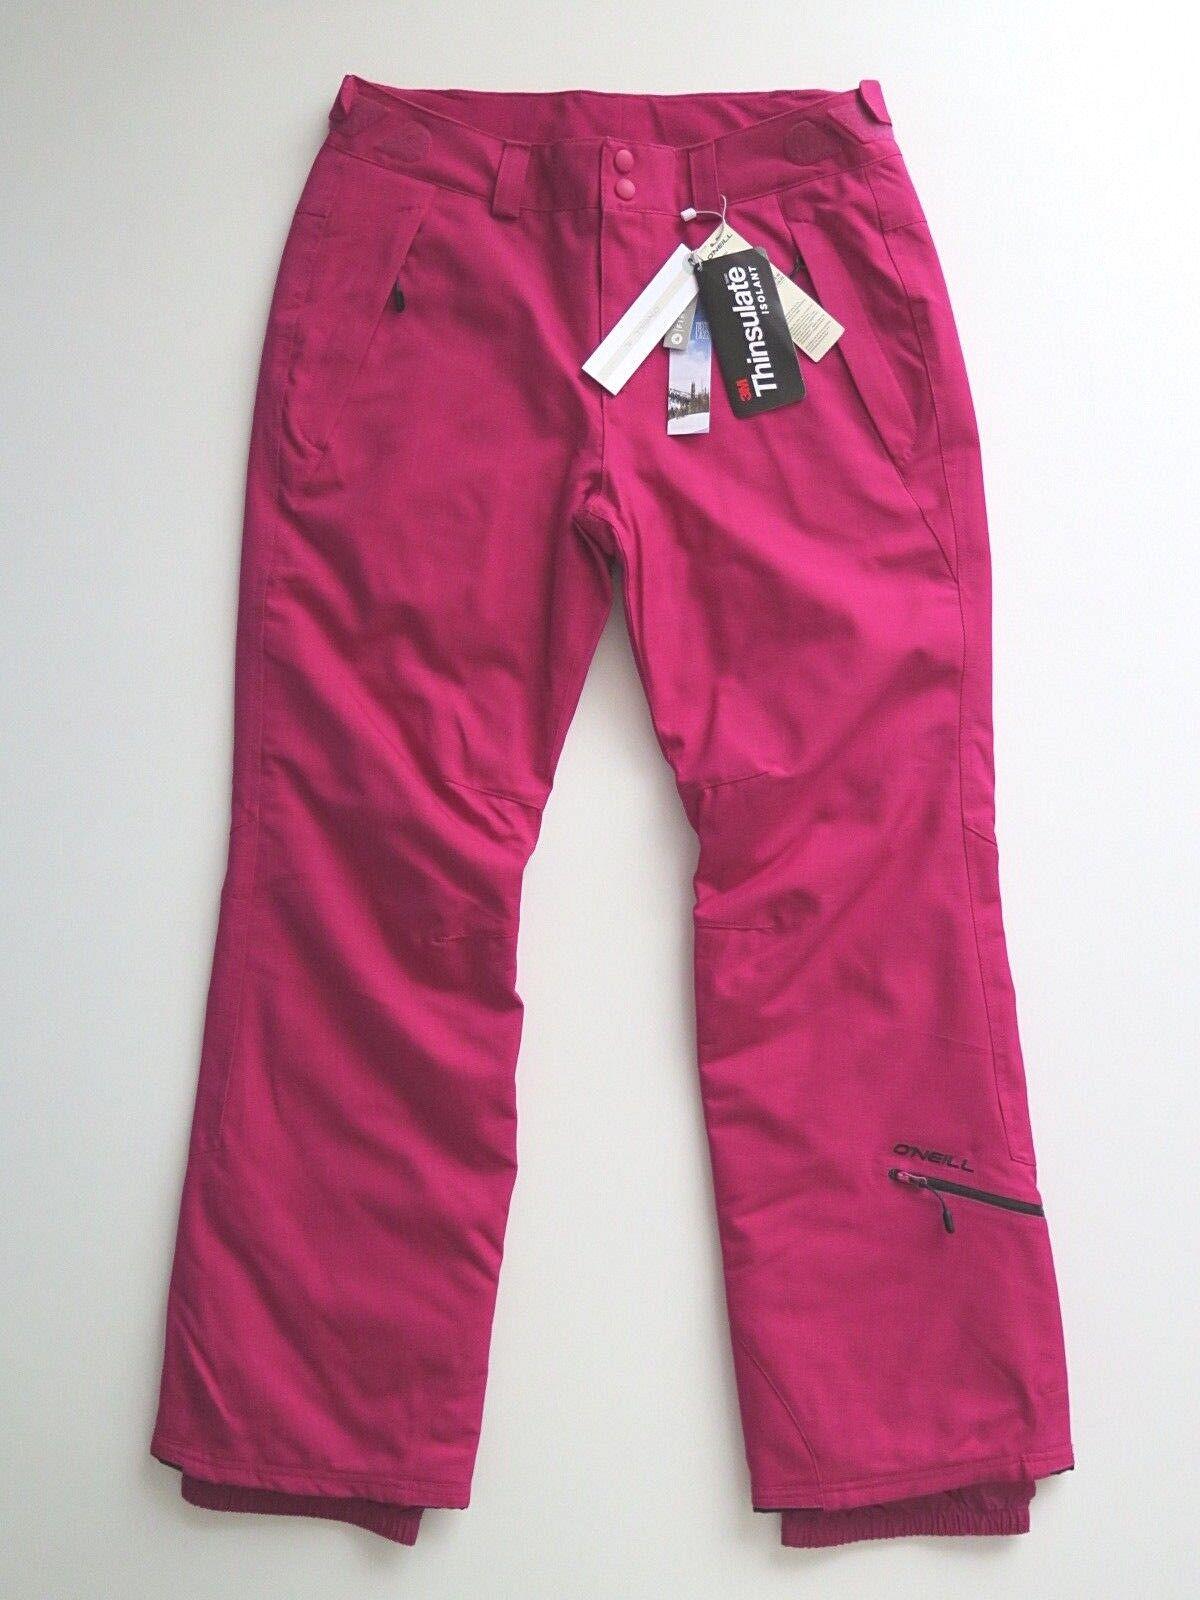 O'NEILL PW Comet Ski Pant Damen Damen Damen Skihose Snowboardhose 10K Stretch Gr. L 1ef809